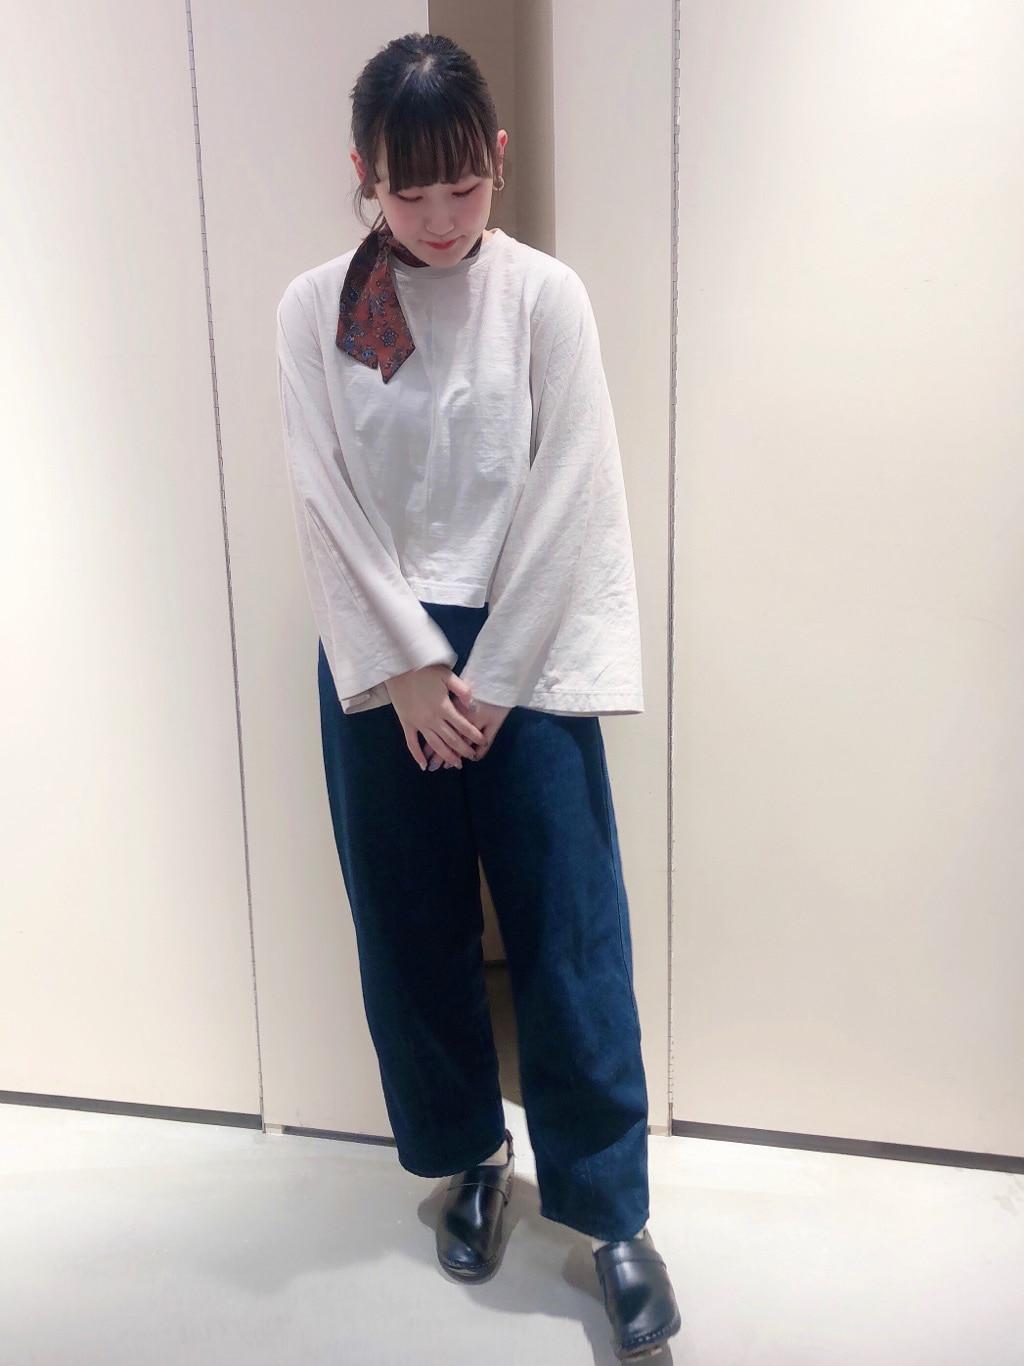 bulle de savon 阪急西宮ガーデンズ 身長:166cm 2020.02.21